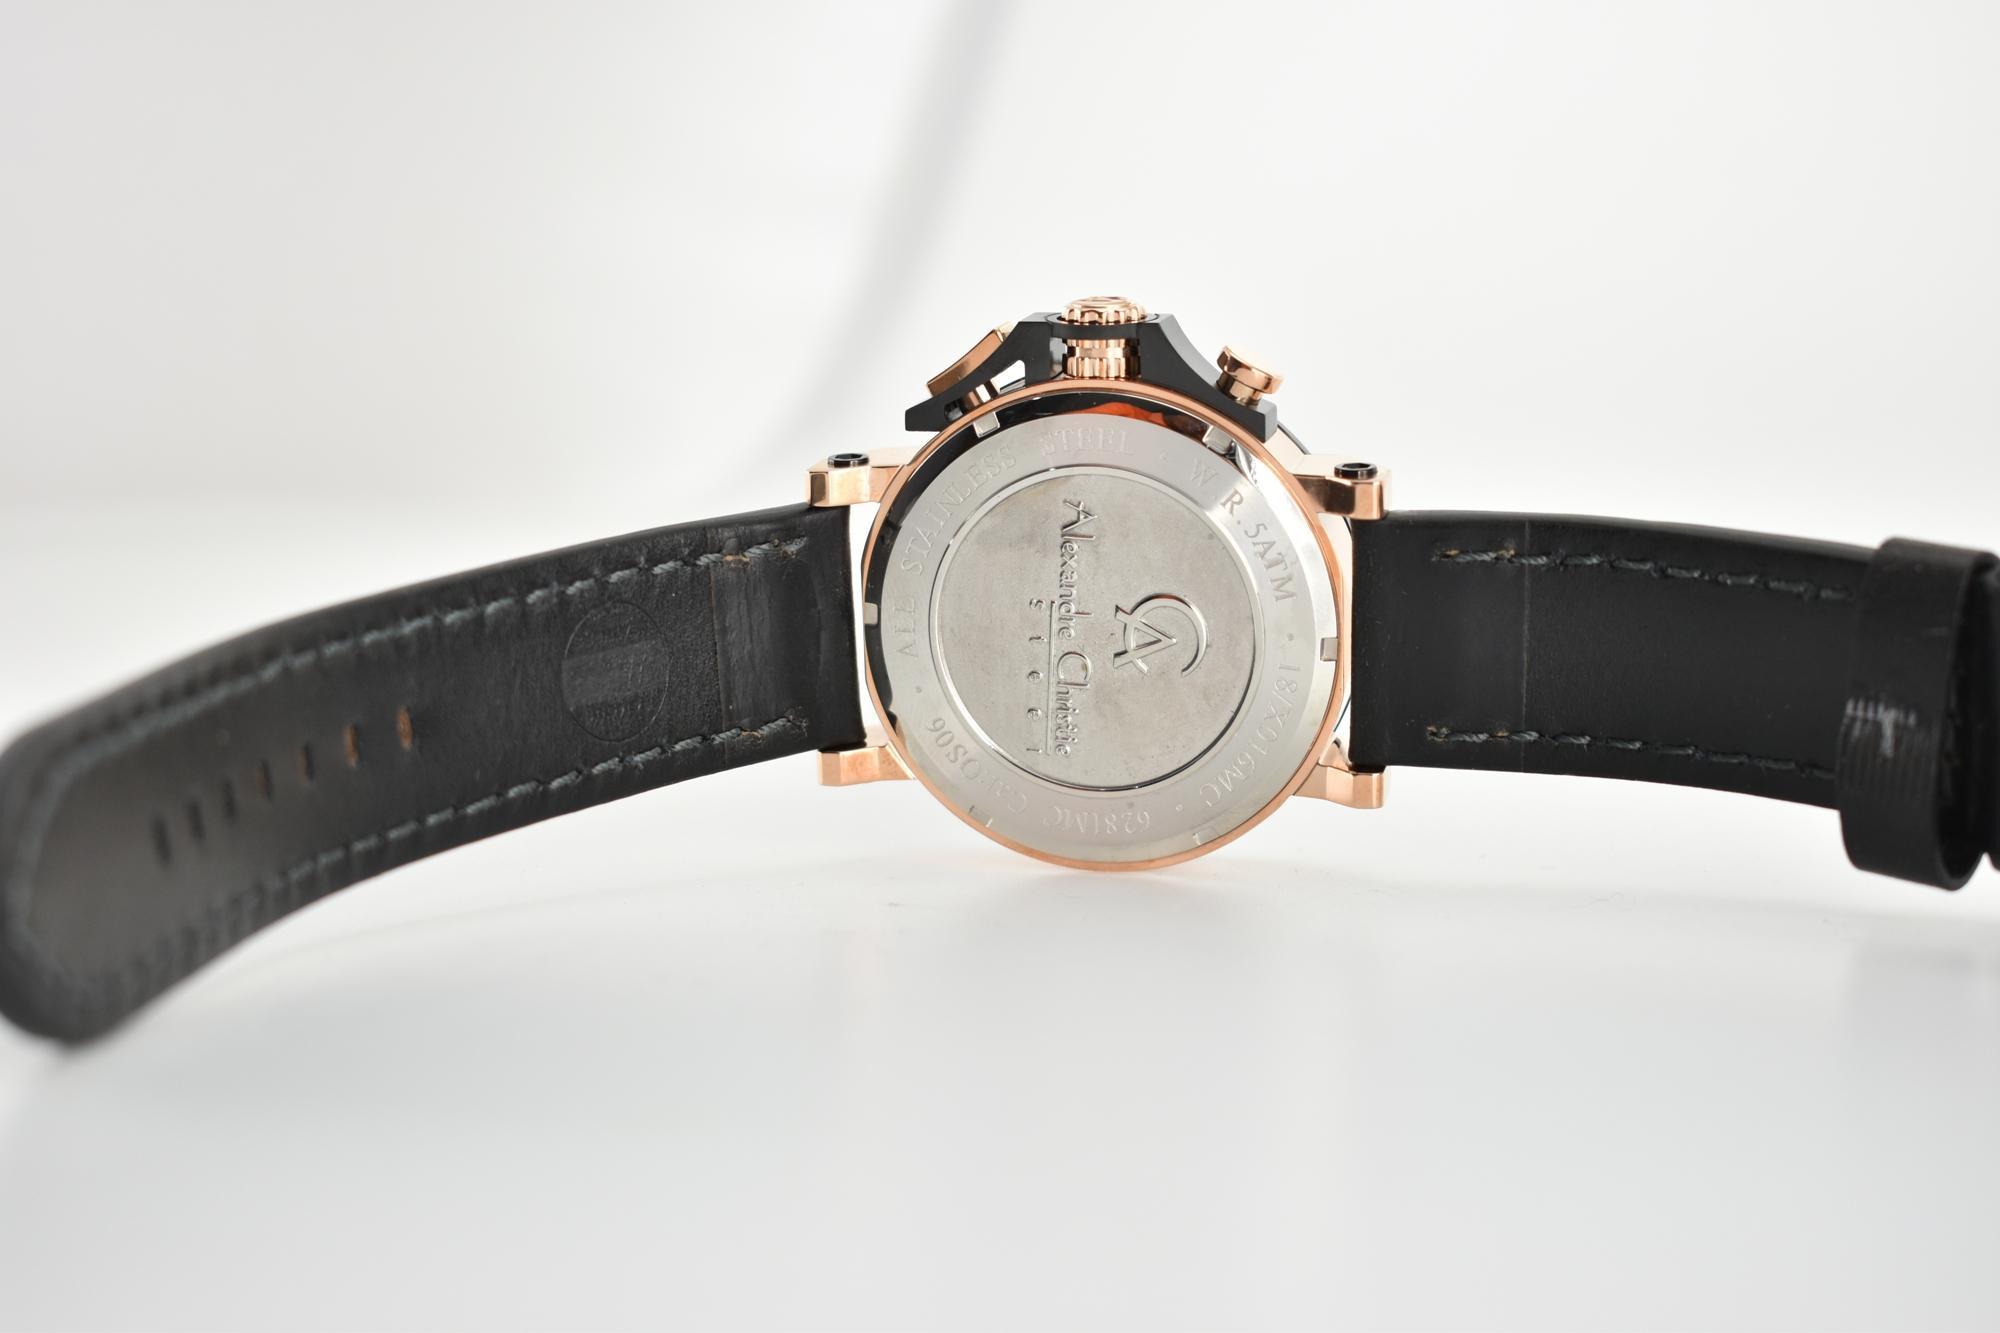 Fitur Alexandre Christie Chronograph Jam Tangan Pria Tali Kulit Case Ac 6453 Silver Black Original Stainless Steel 6281 Biru Blue Navy